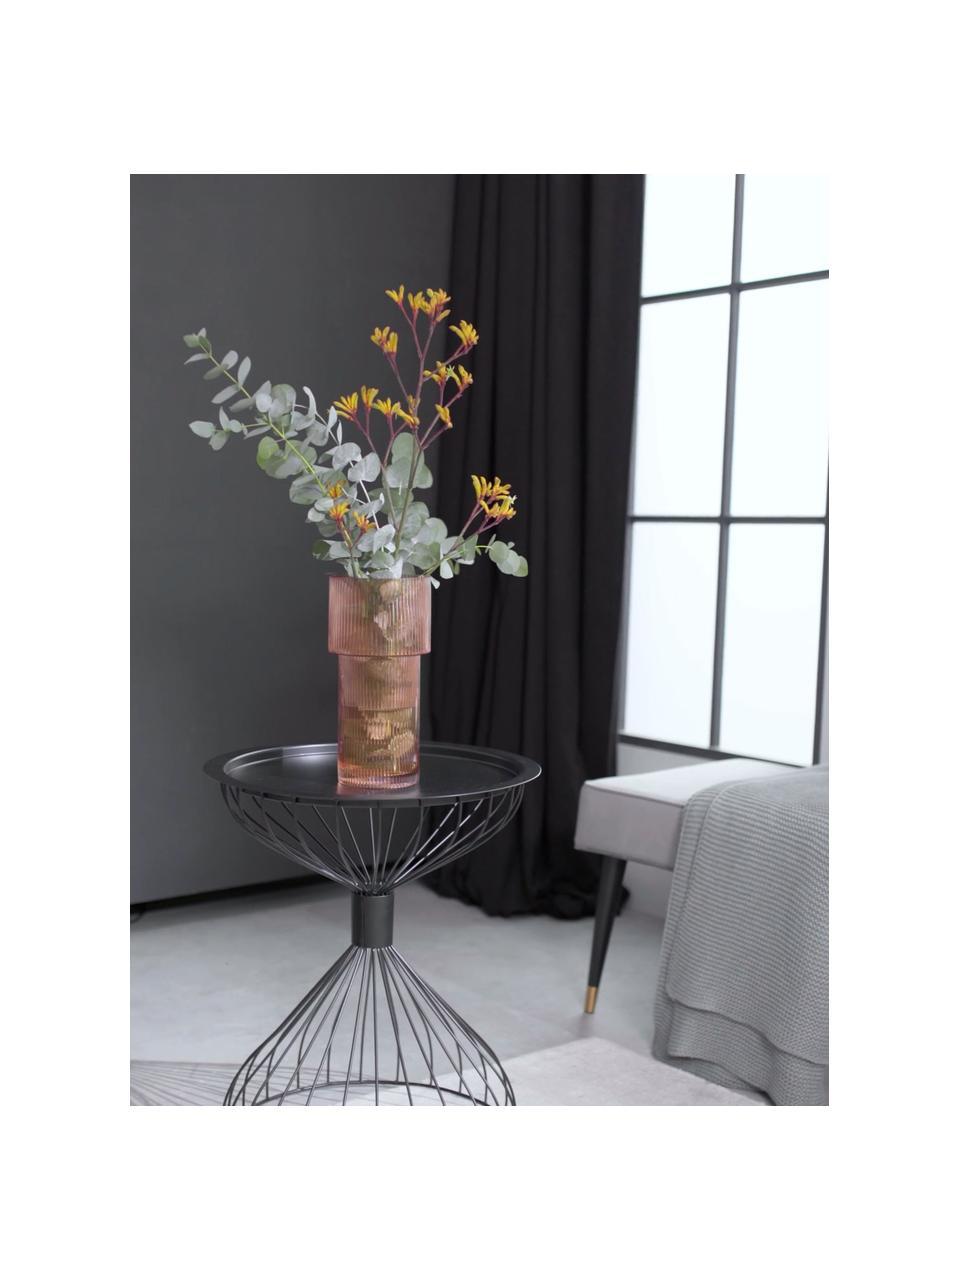 Glas-Vase Lija, Glas, Bernsteinfarben, transparent, Ø 14 x H 30 cm